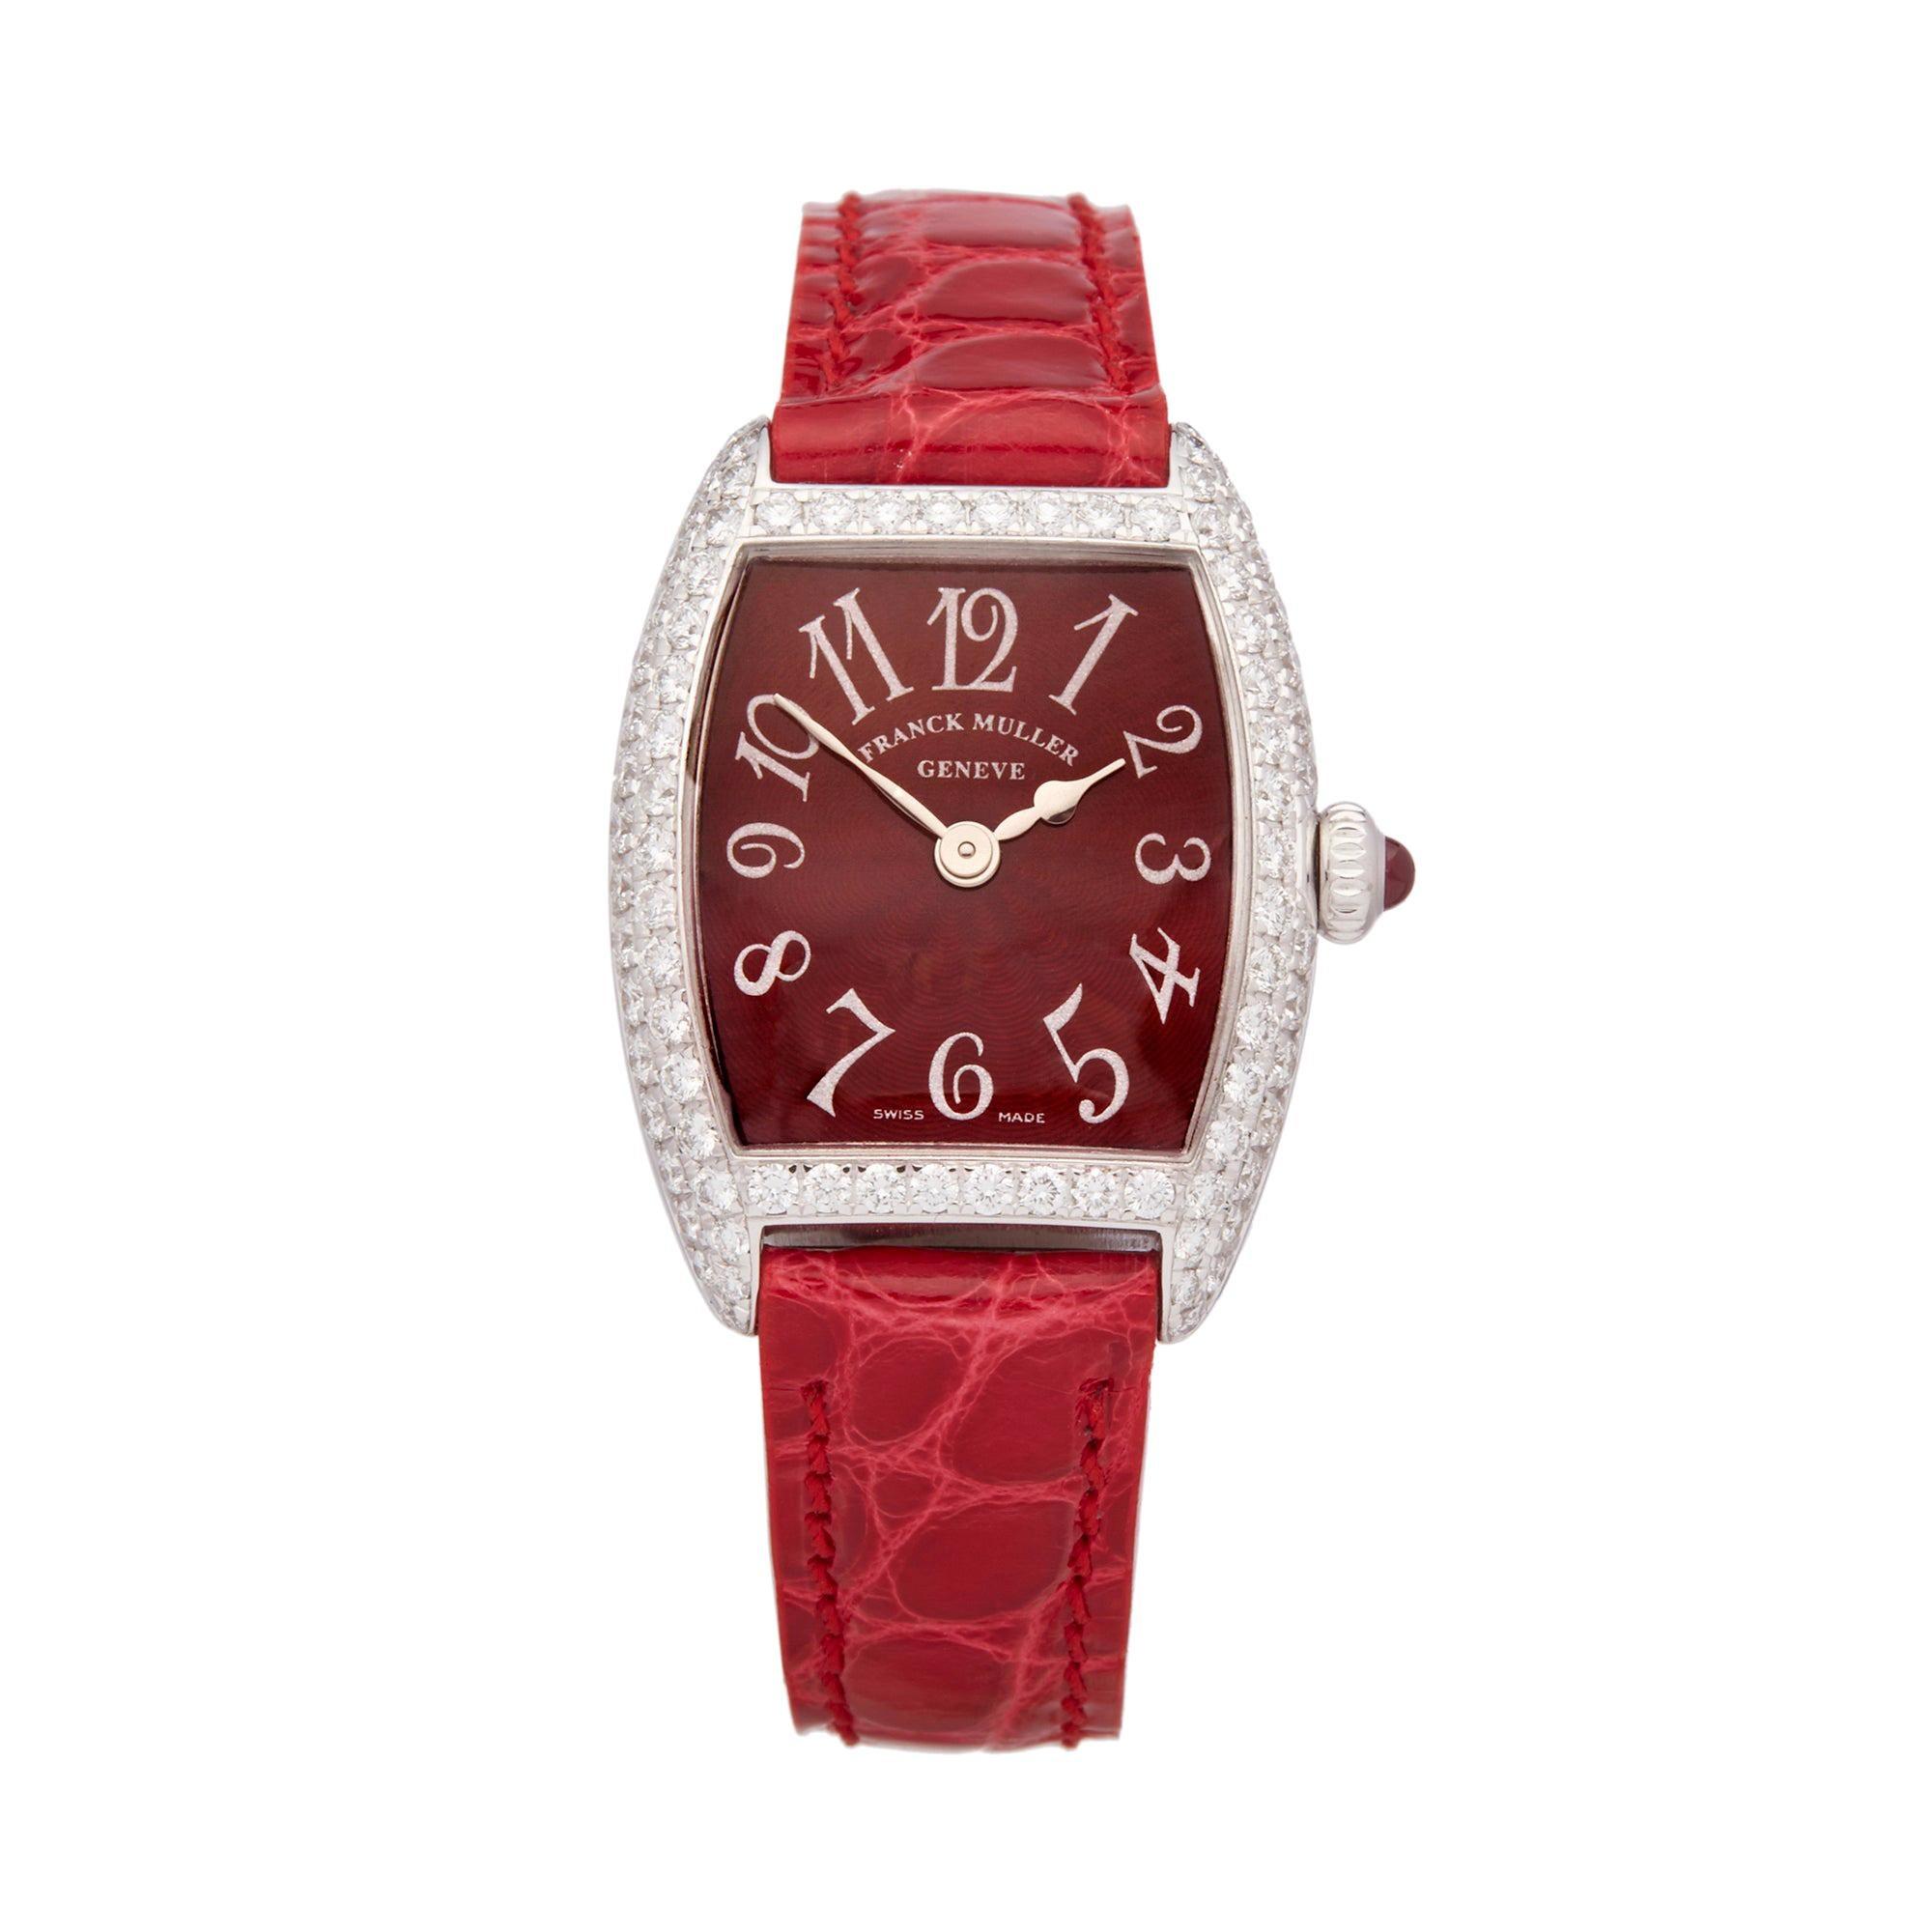 ddb0354d920c8 Franck Muller, Ladies Cintree Curvex Chronometro, 18 Karat Gold and  Diamonds For Sale at 1stdibs